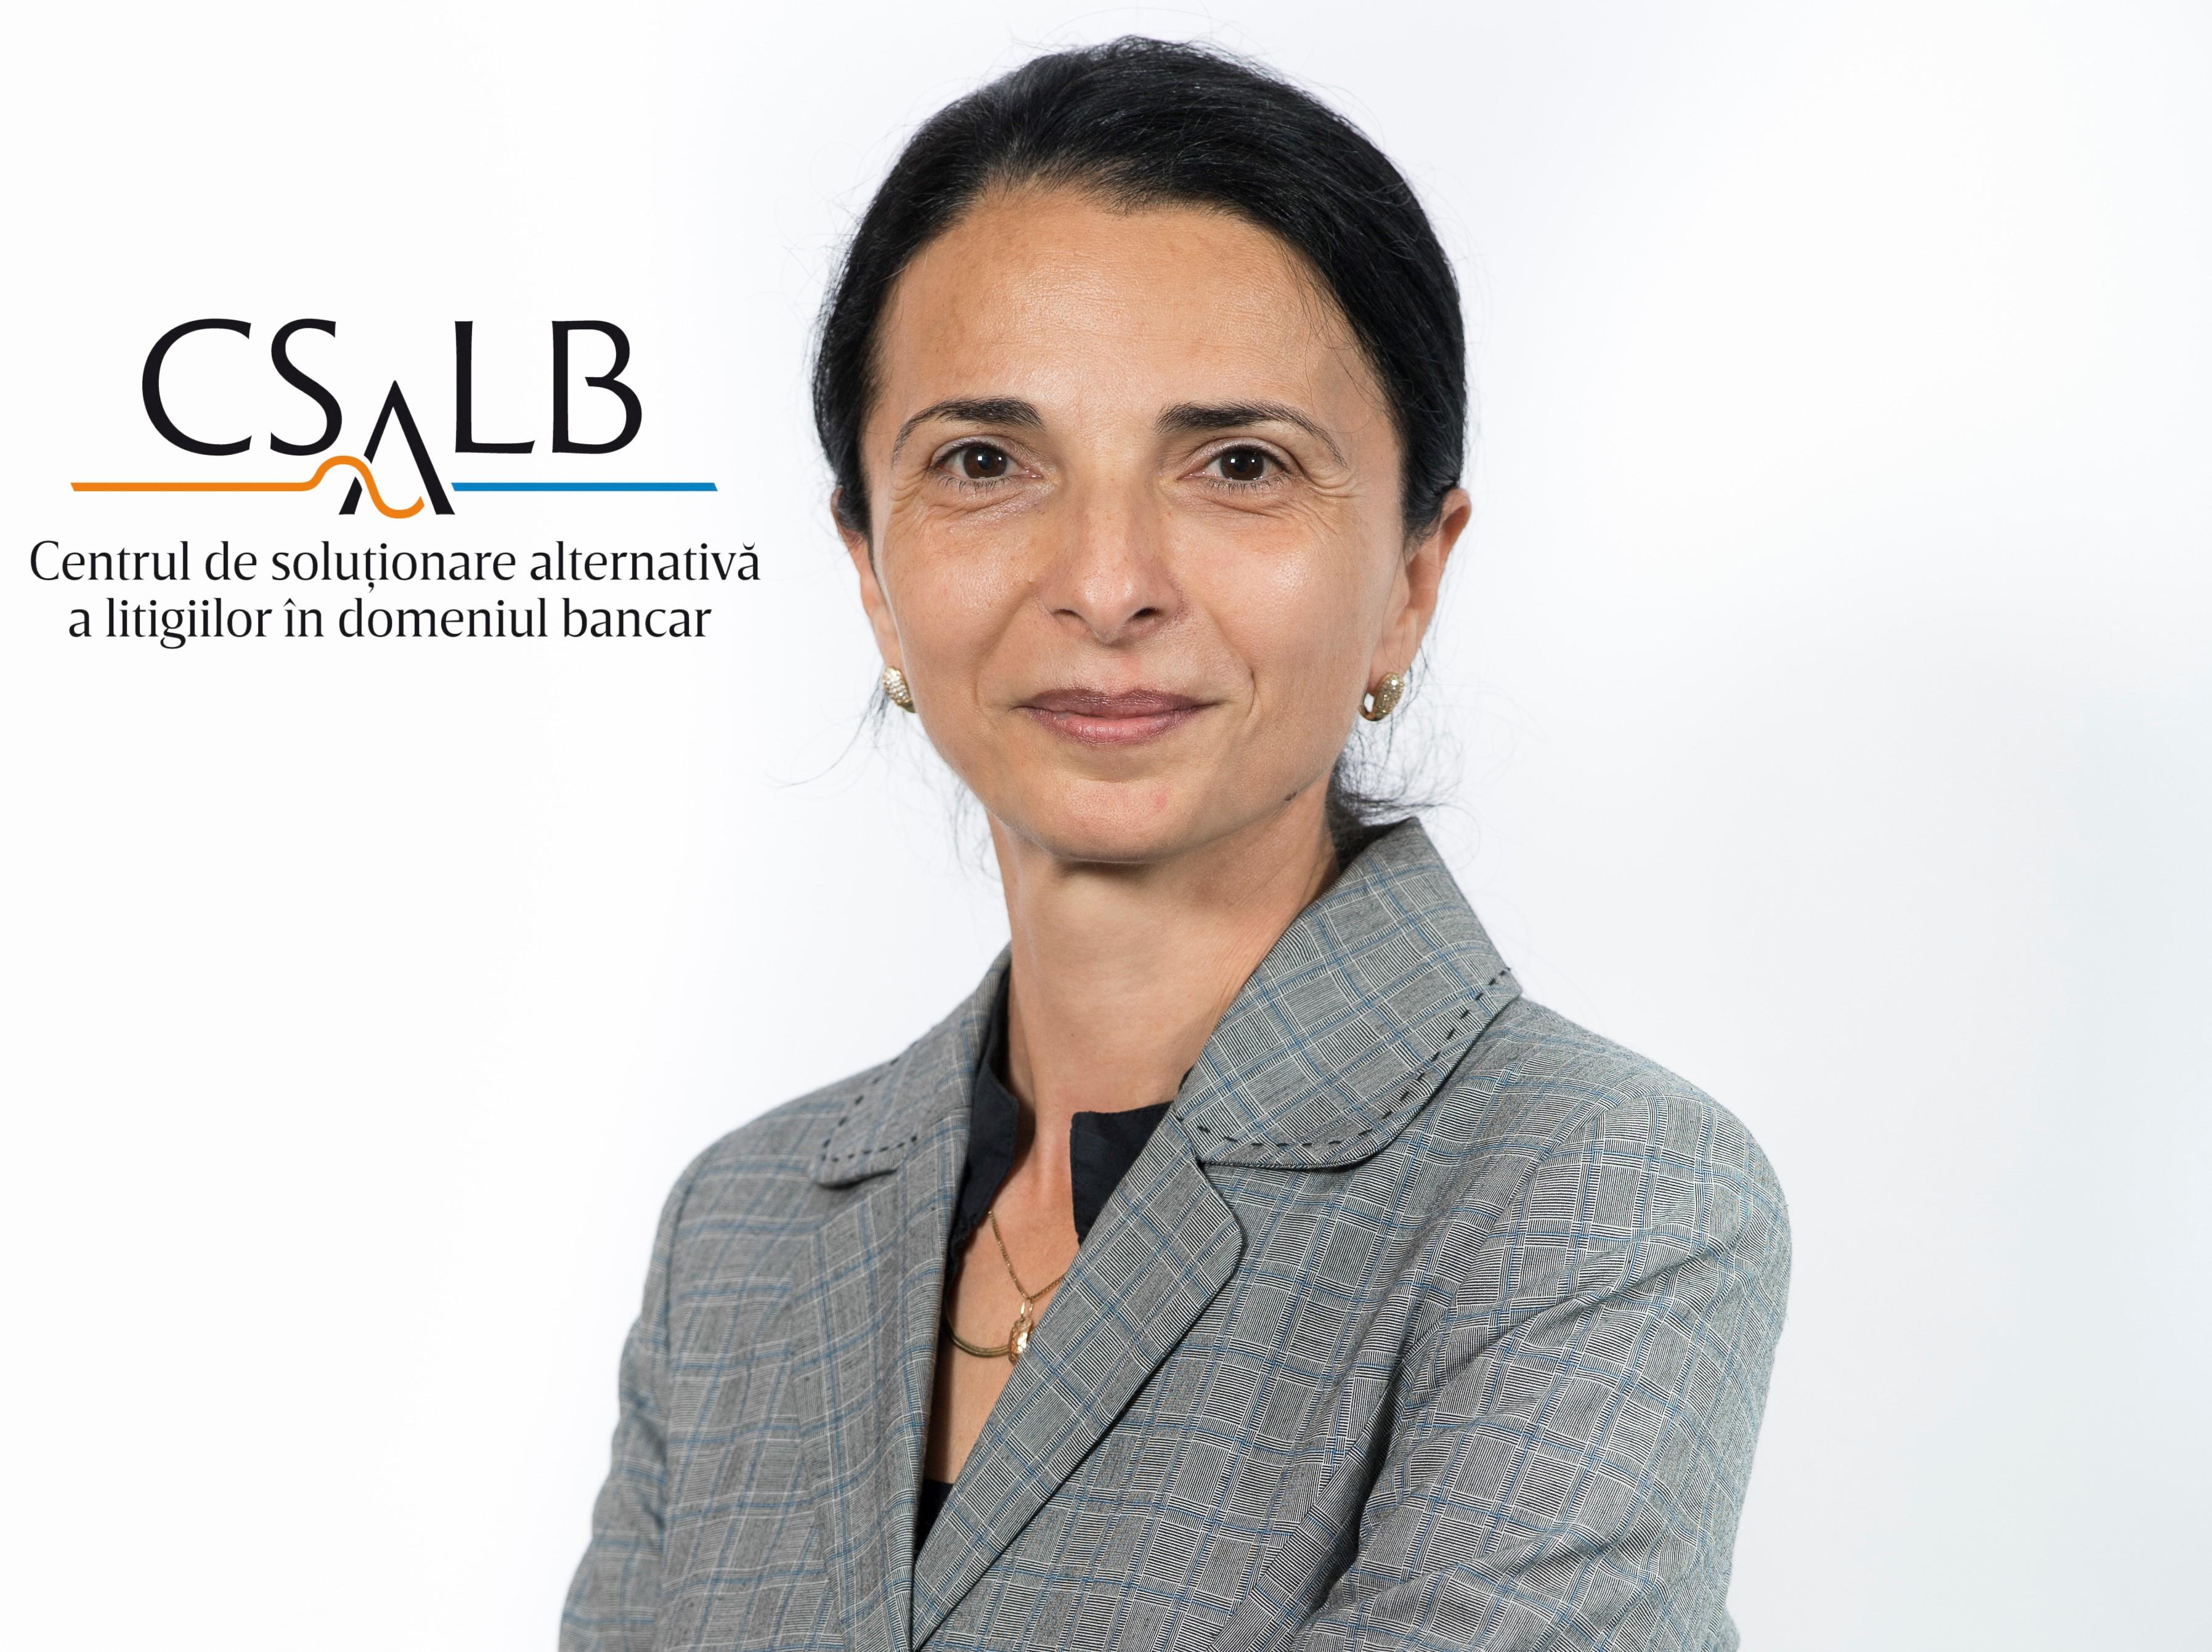 Nela Petrișor, conciliator CSALB